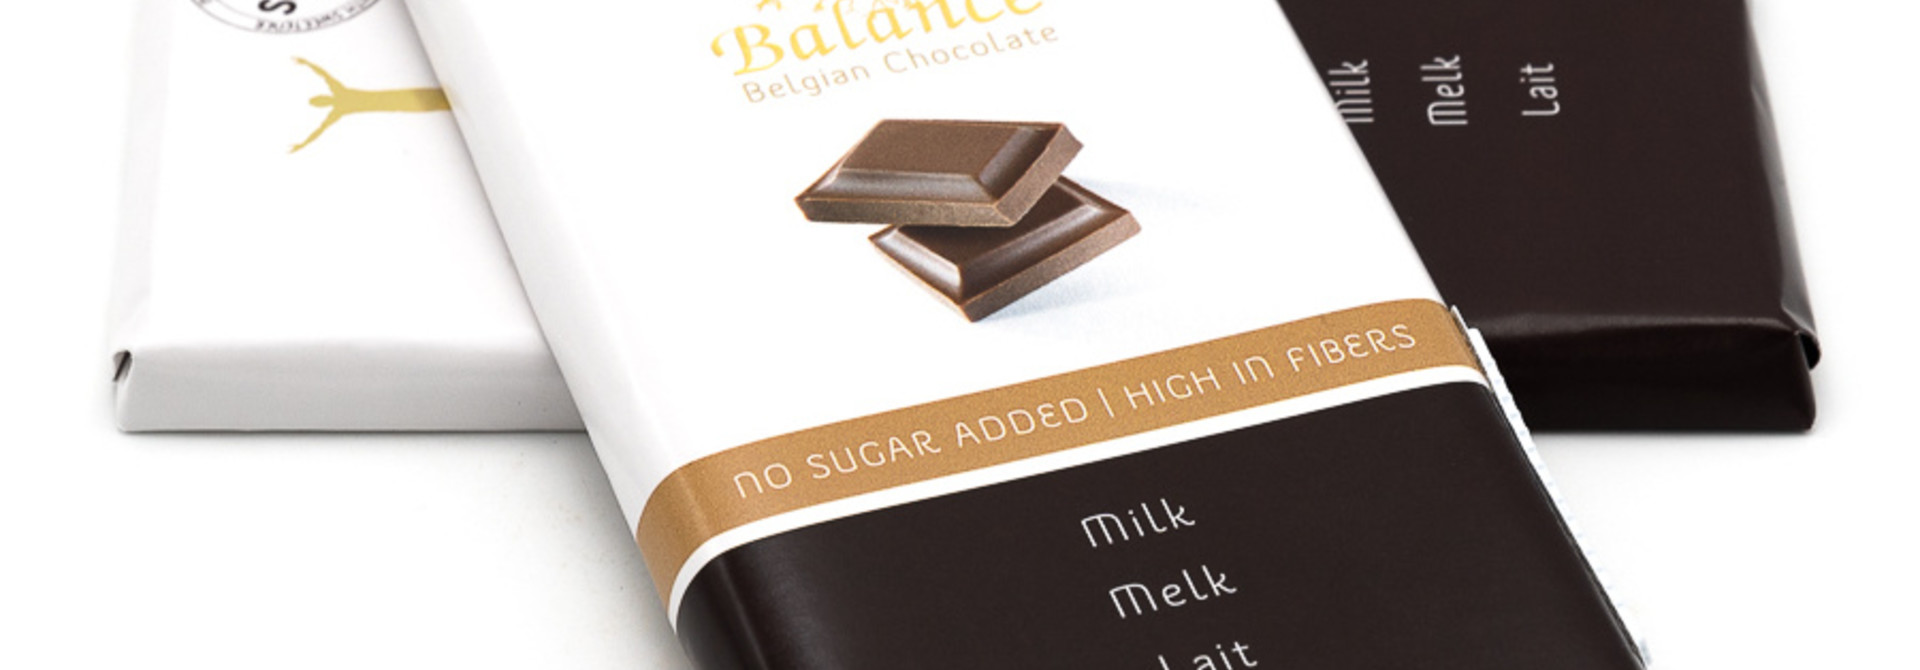 Chocolate bar (milk)